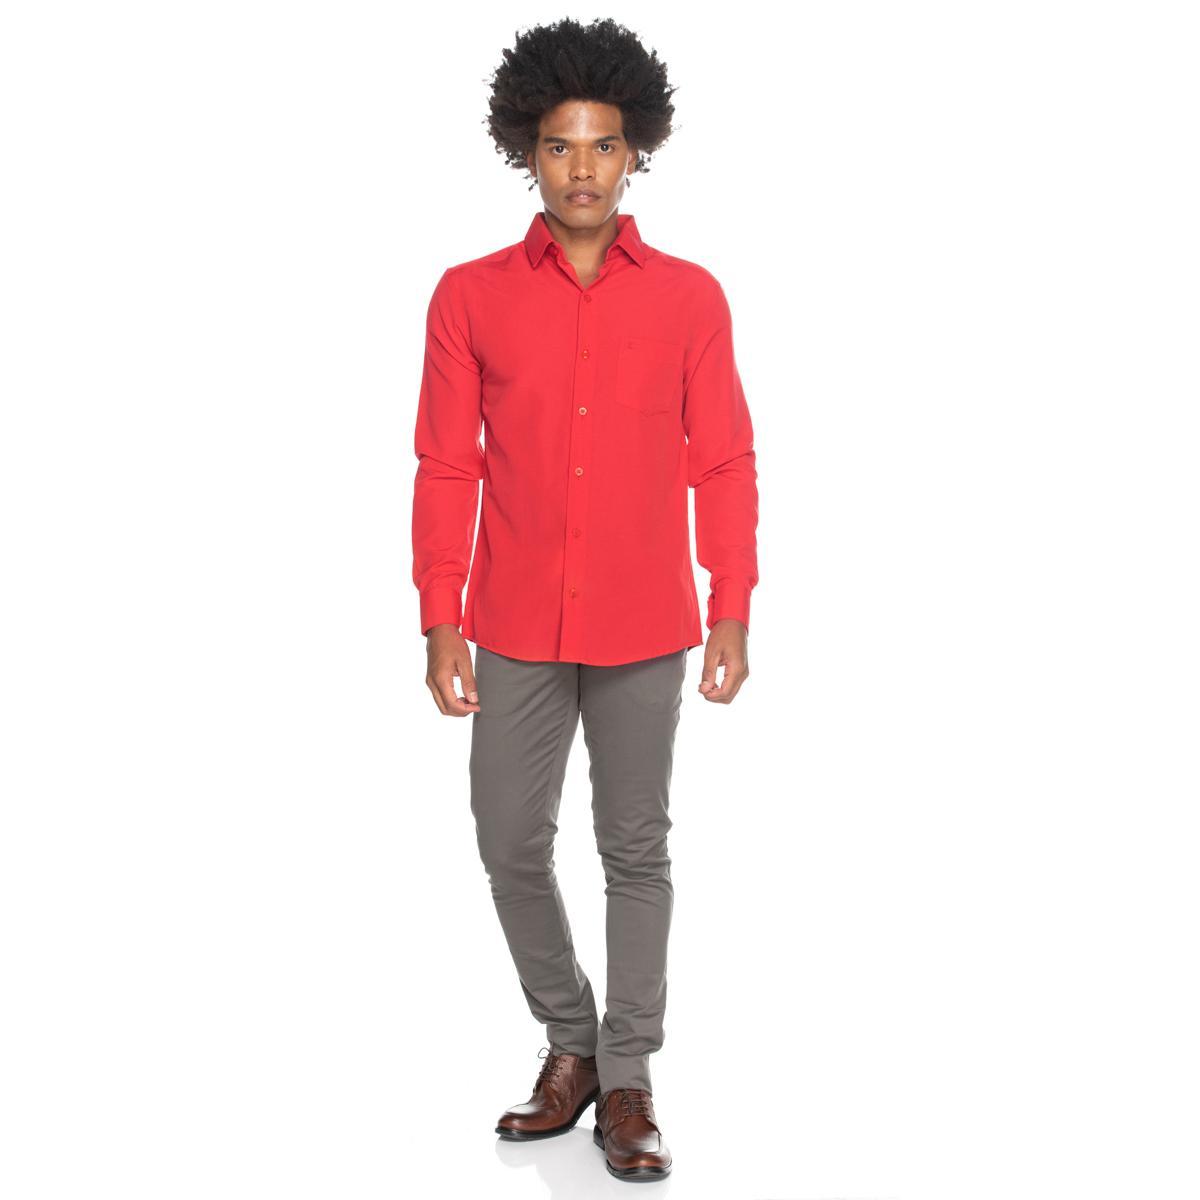 Camisa Social Teodoro Masculina Manga Longa Slim Fit Casual Vermelho G